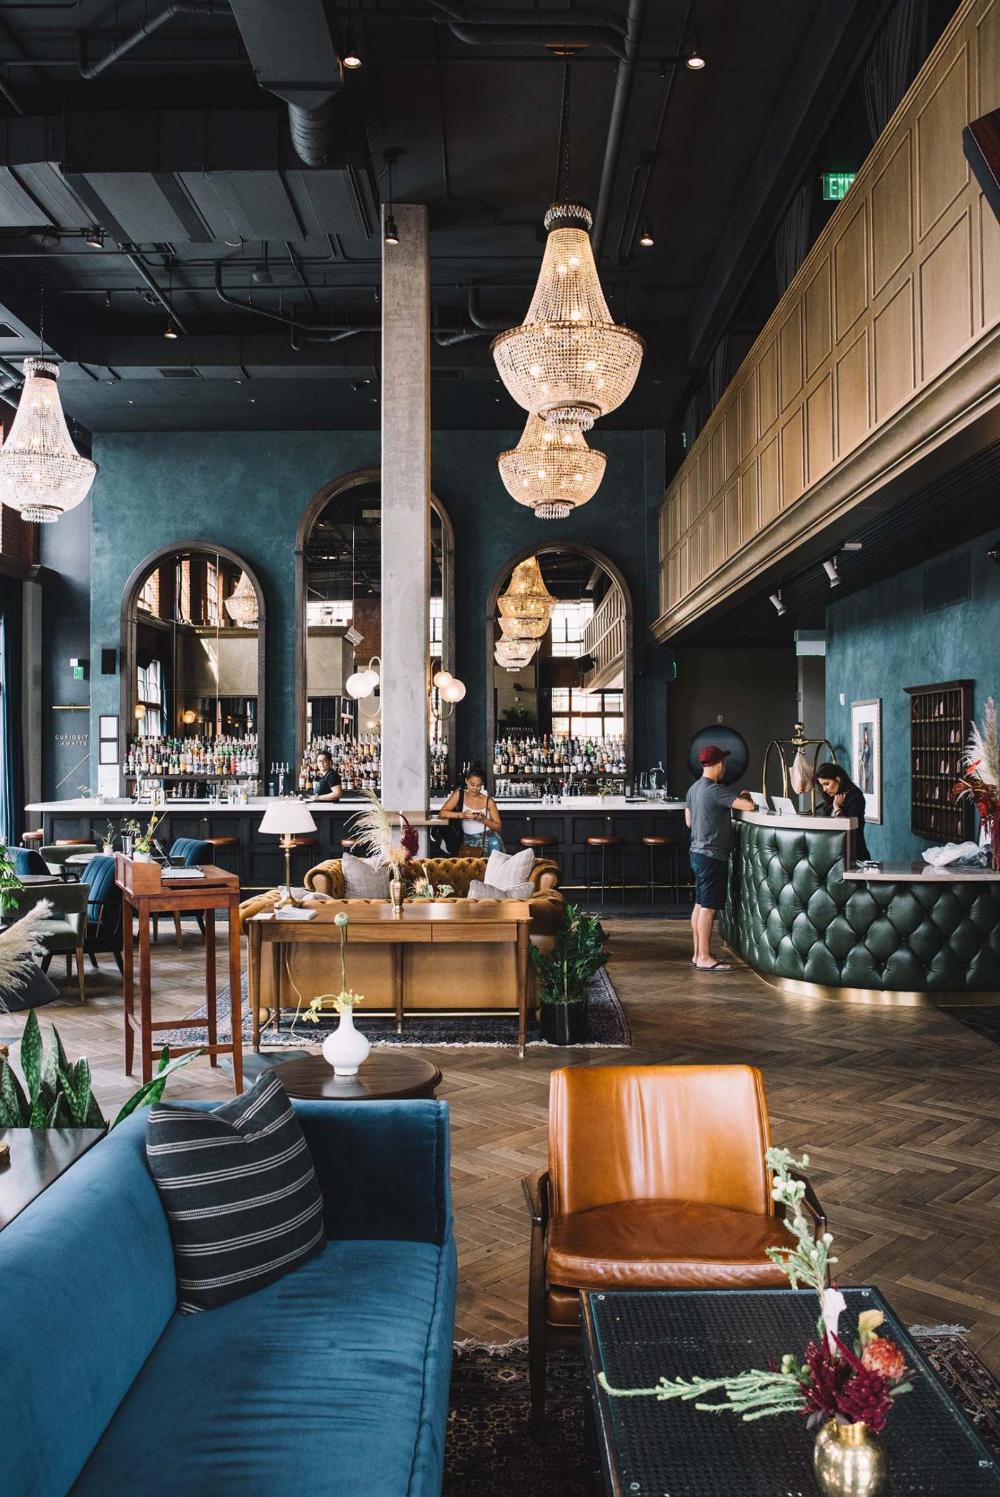 A Long Weekend At Denver S Hottest New Hotel Bar Bar Design Restaurant Hotel Bar Bar Interior Design